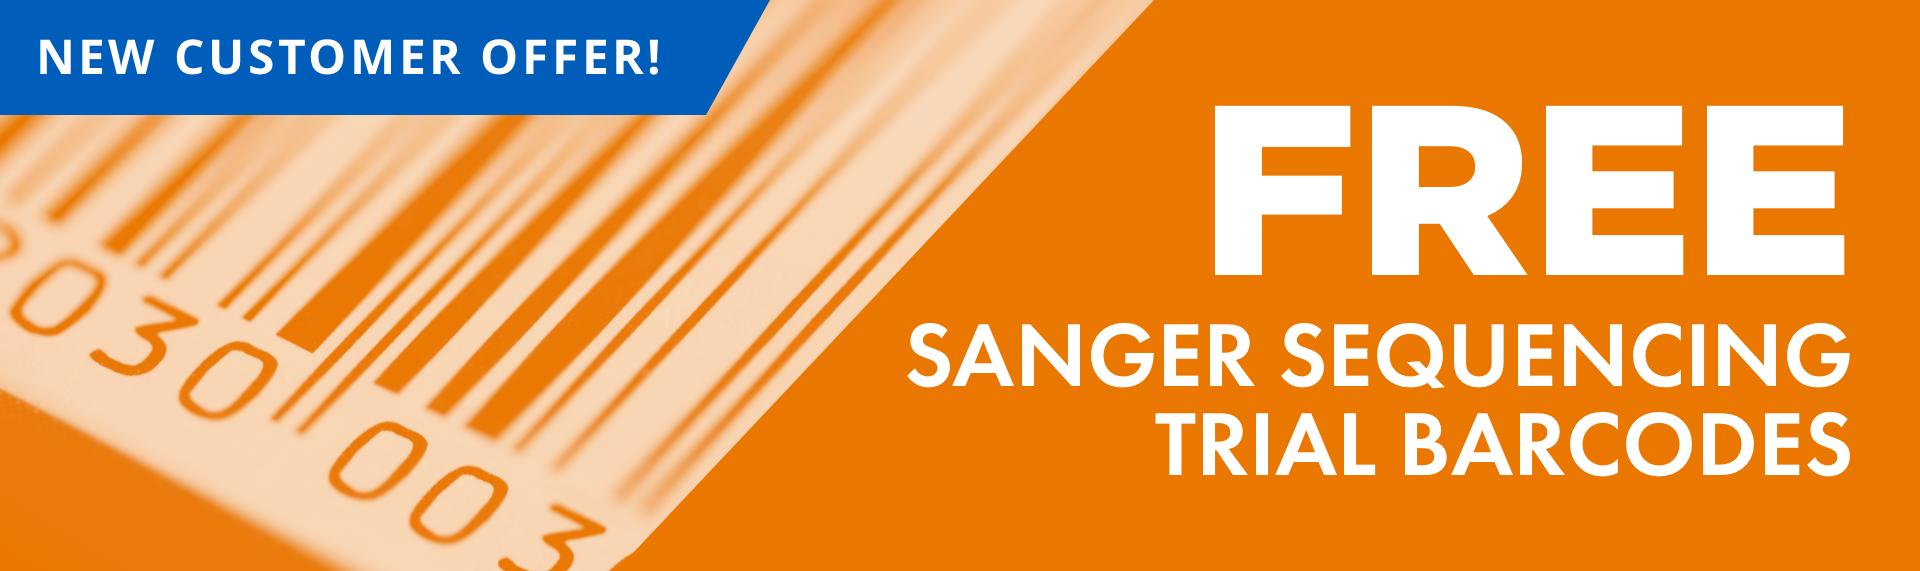 Sanger_Free_Trial_Barcodes_EU_Landing_Page_July22_2020